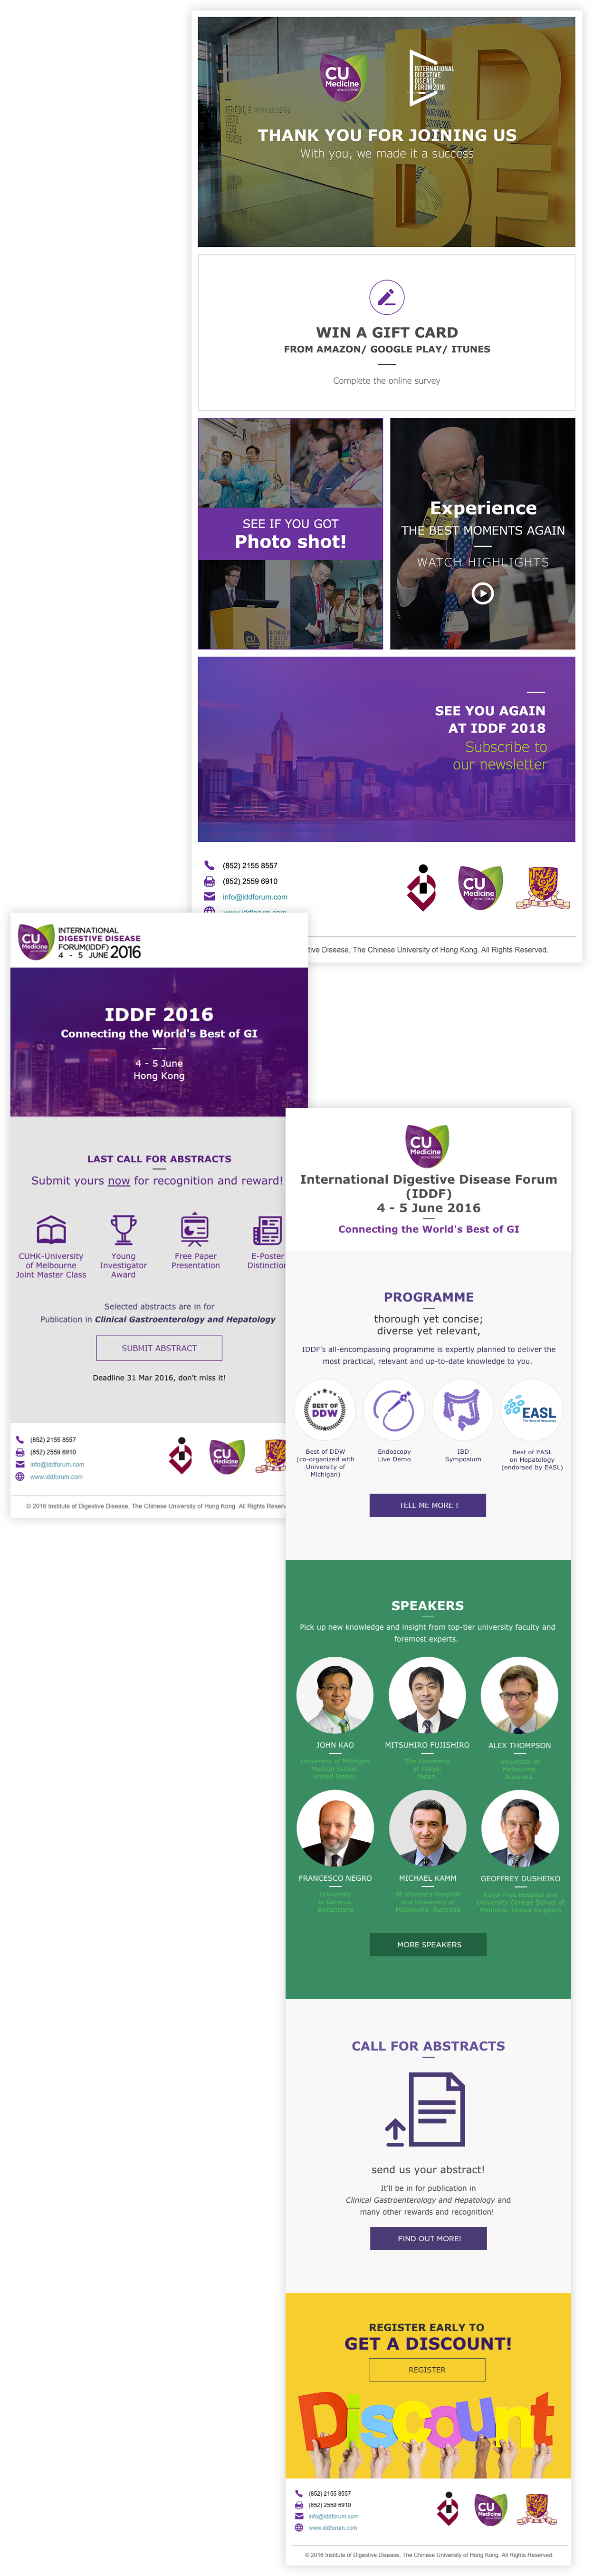 International Digestive Disease Forum (IDDF) Enewsletter, CUHK